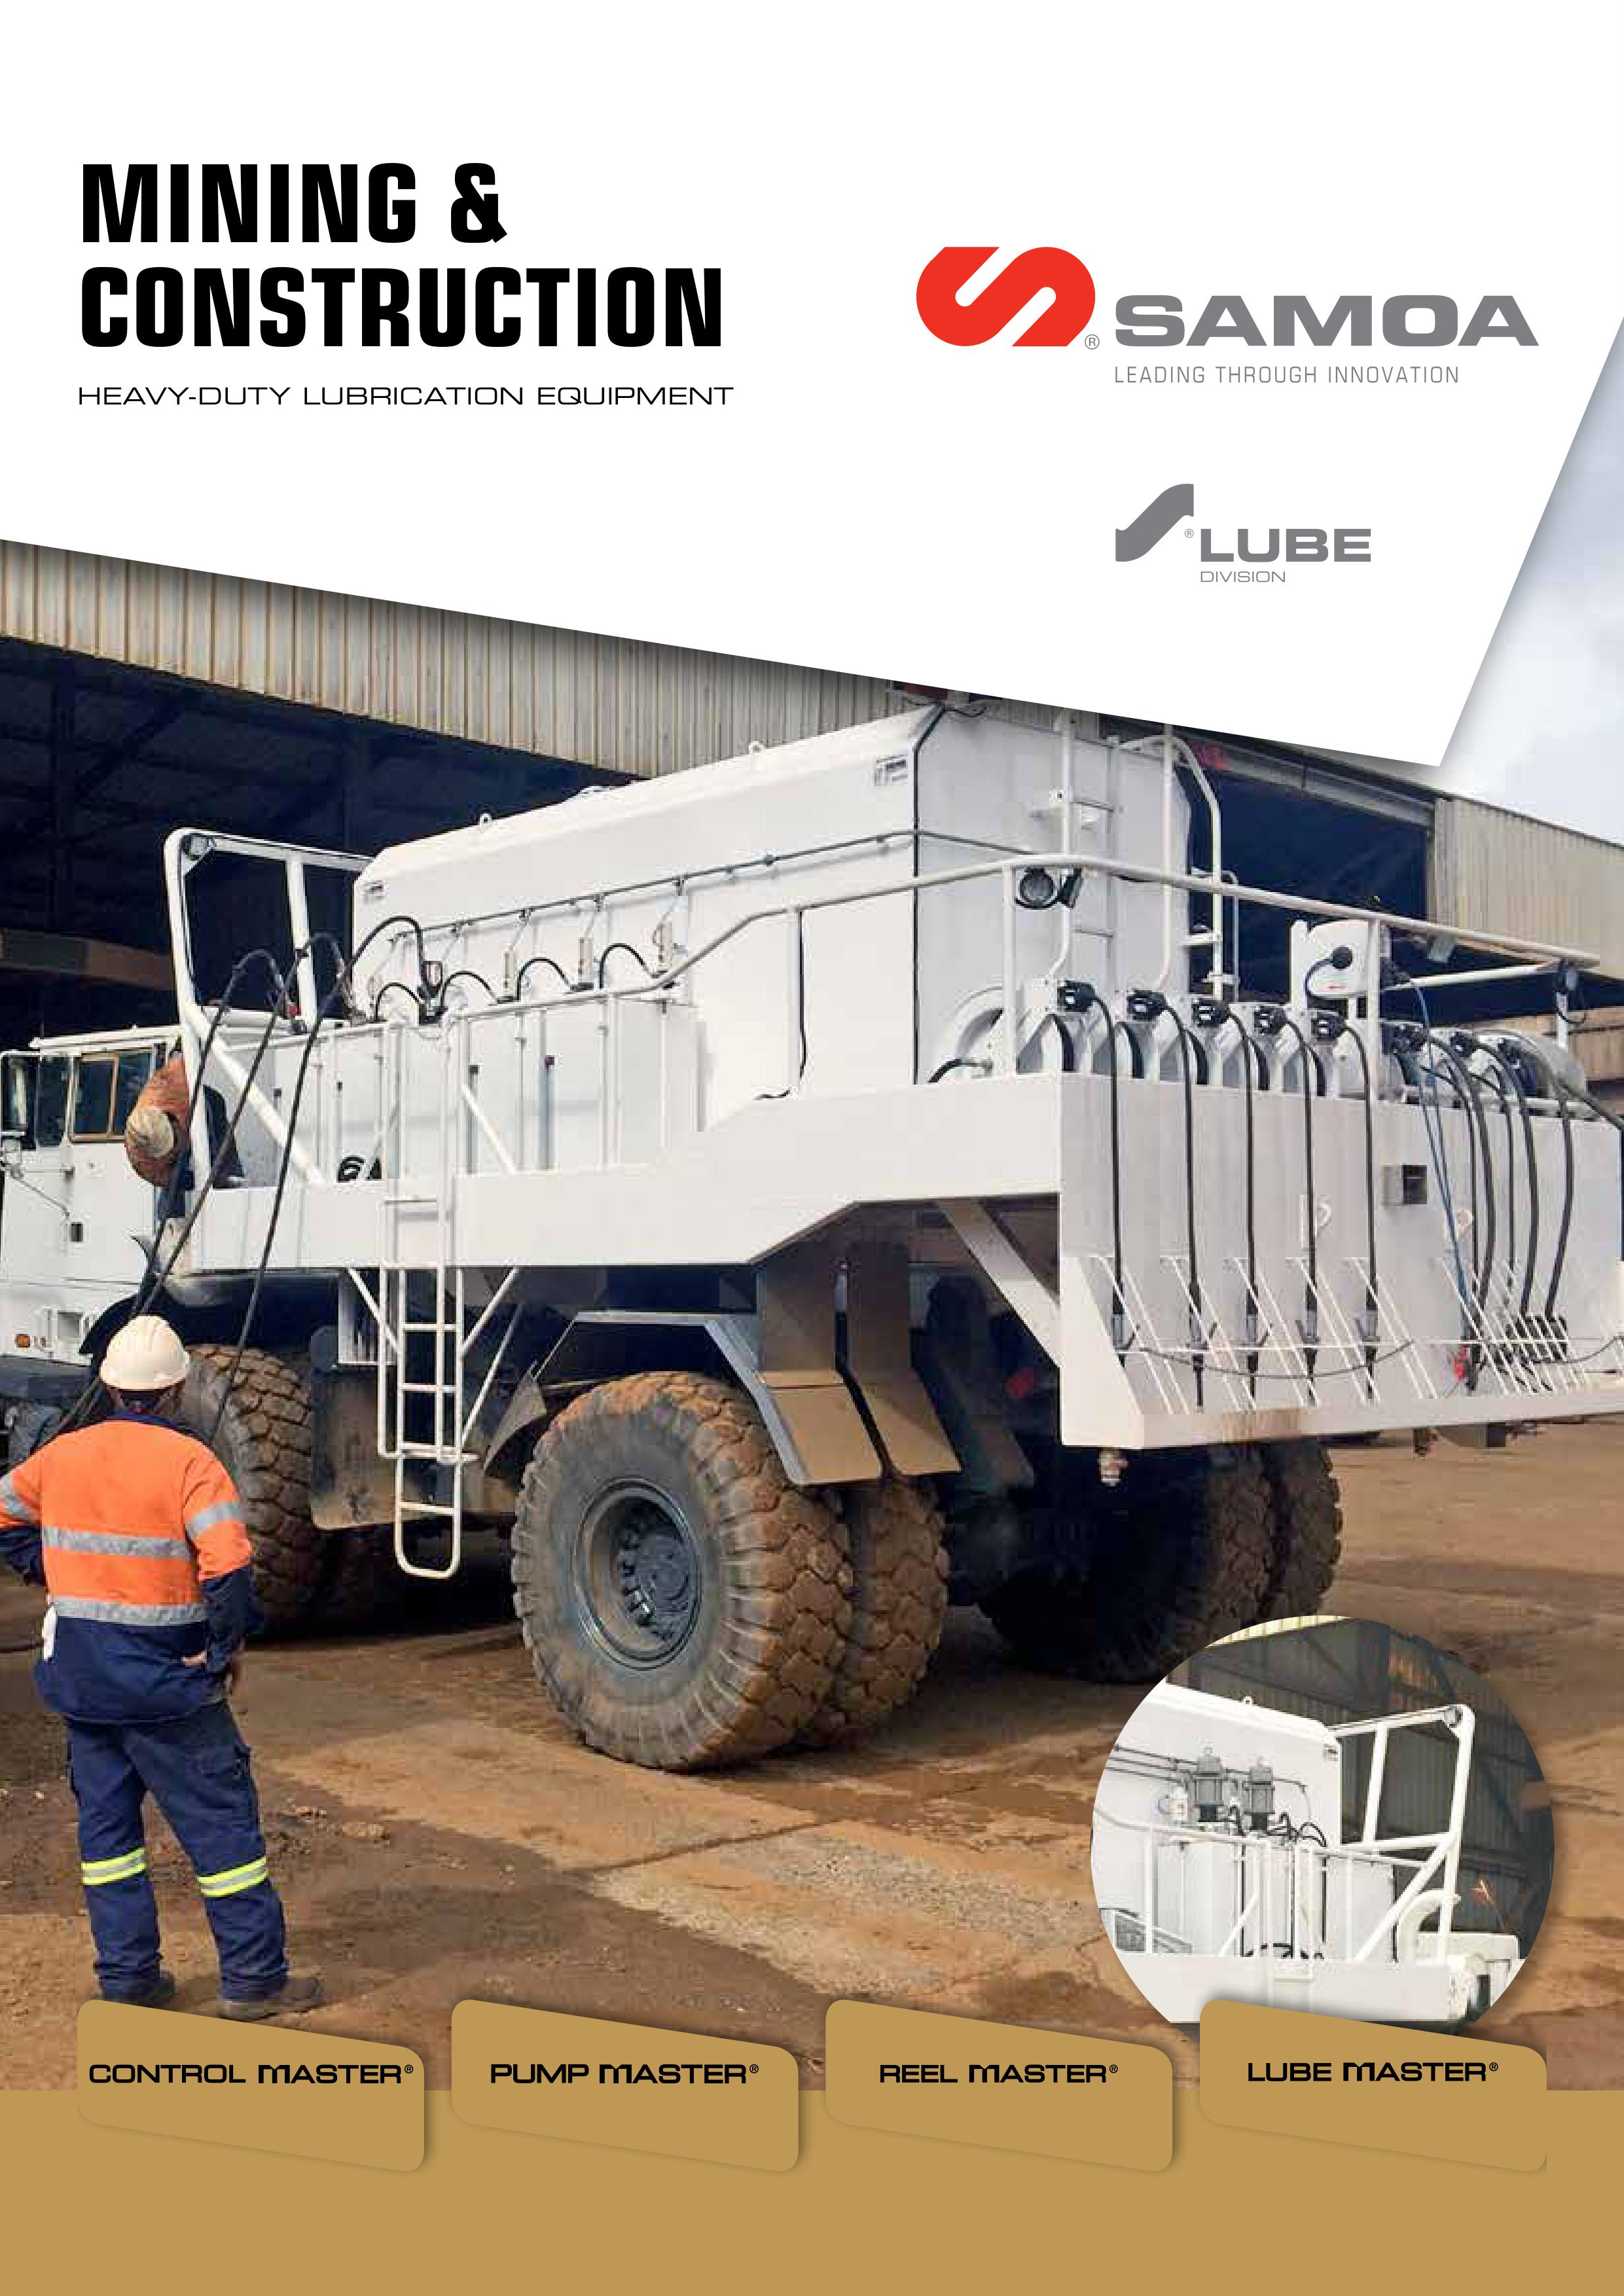 SAMOA Mining & Construction Brochure Cover